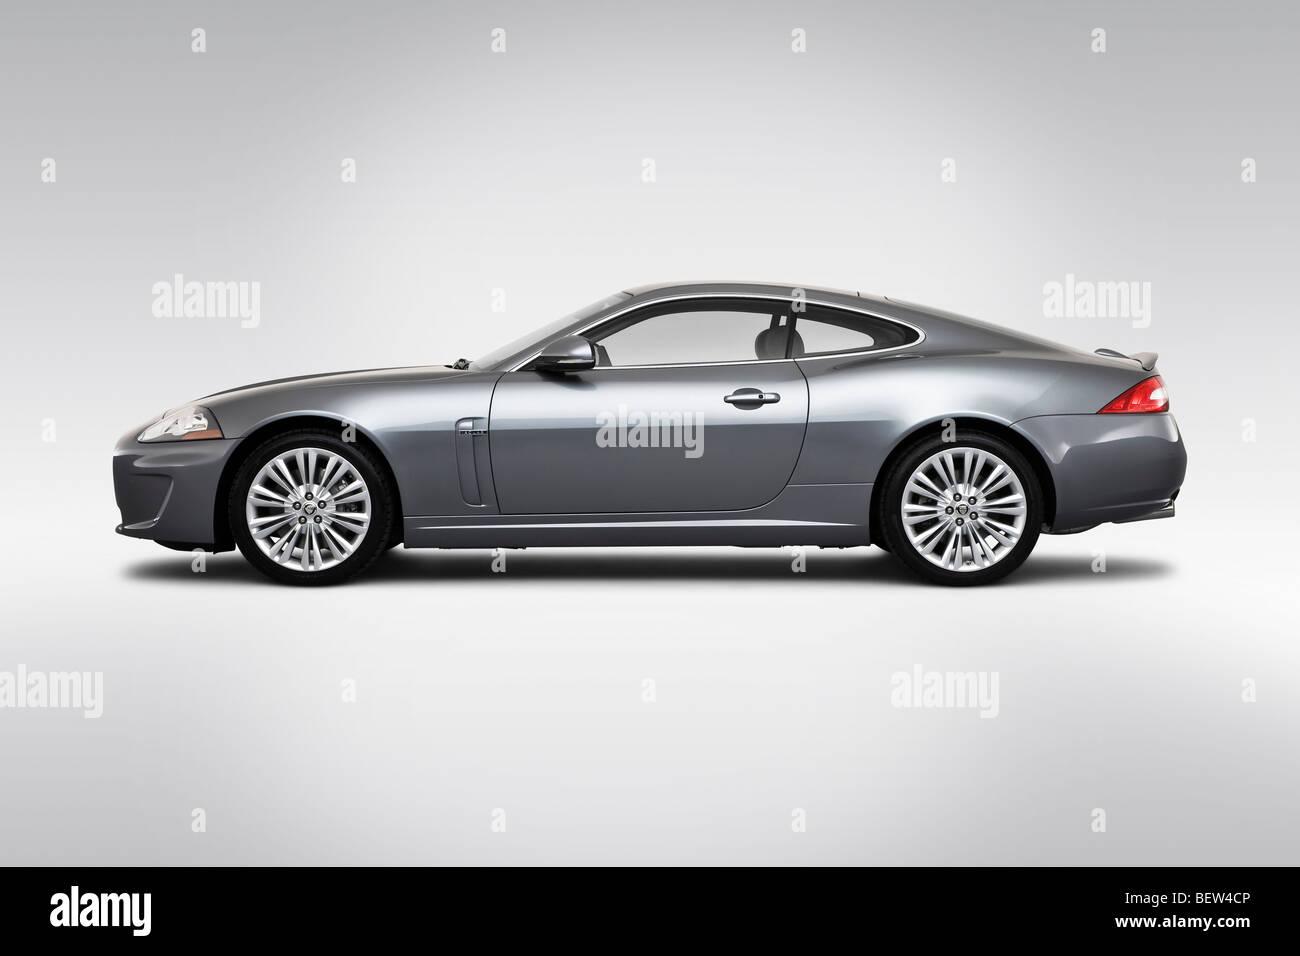 2010 Jaguar XK In Gray   Drivers Side Profile